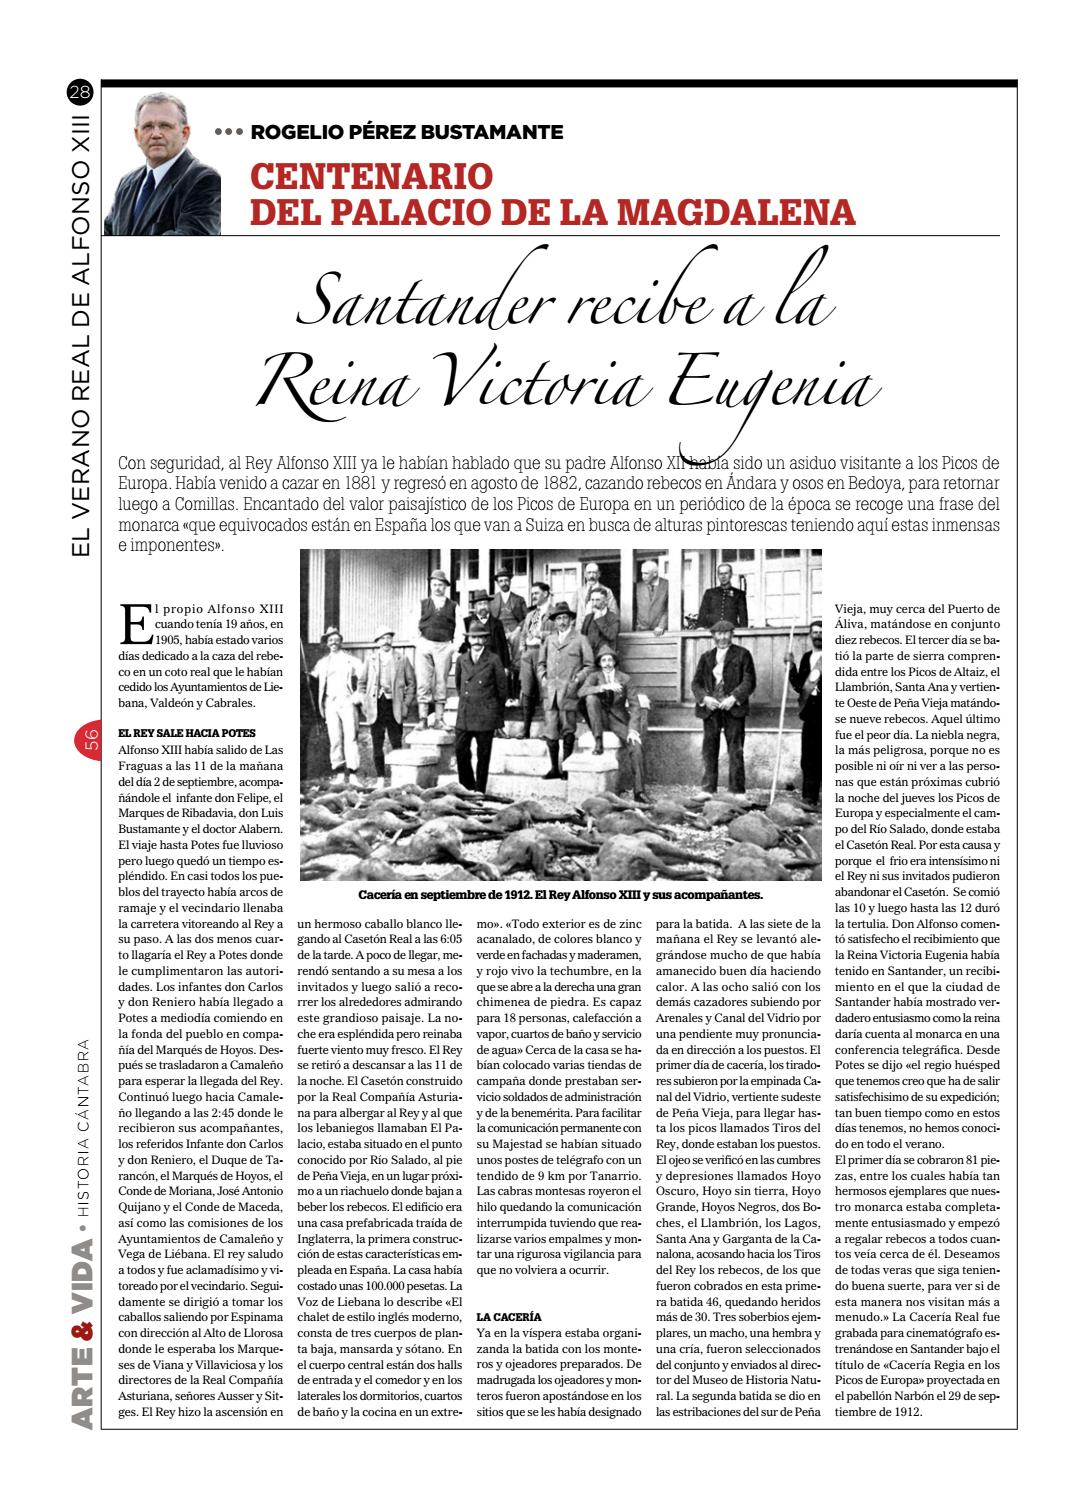 Veraneo real todas by emna quintero - issuu